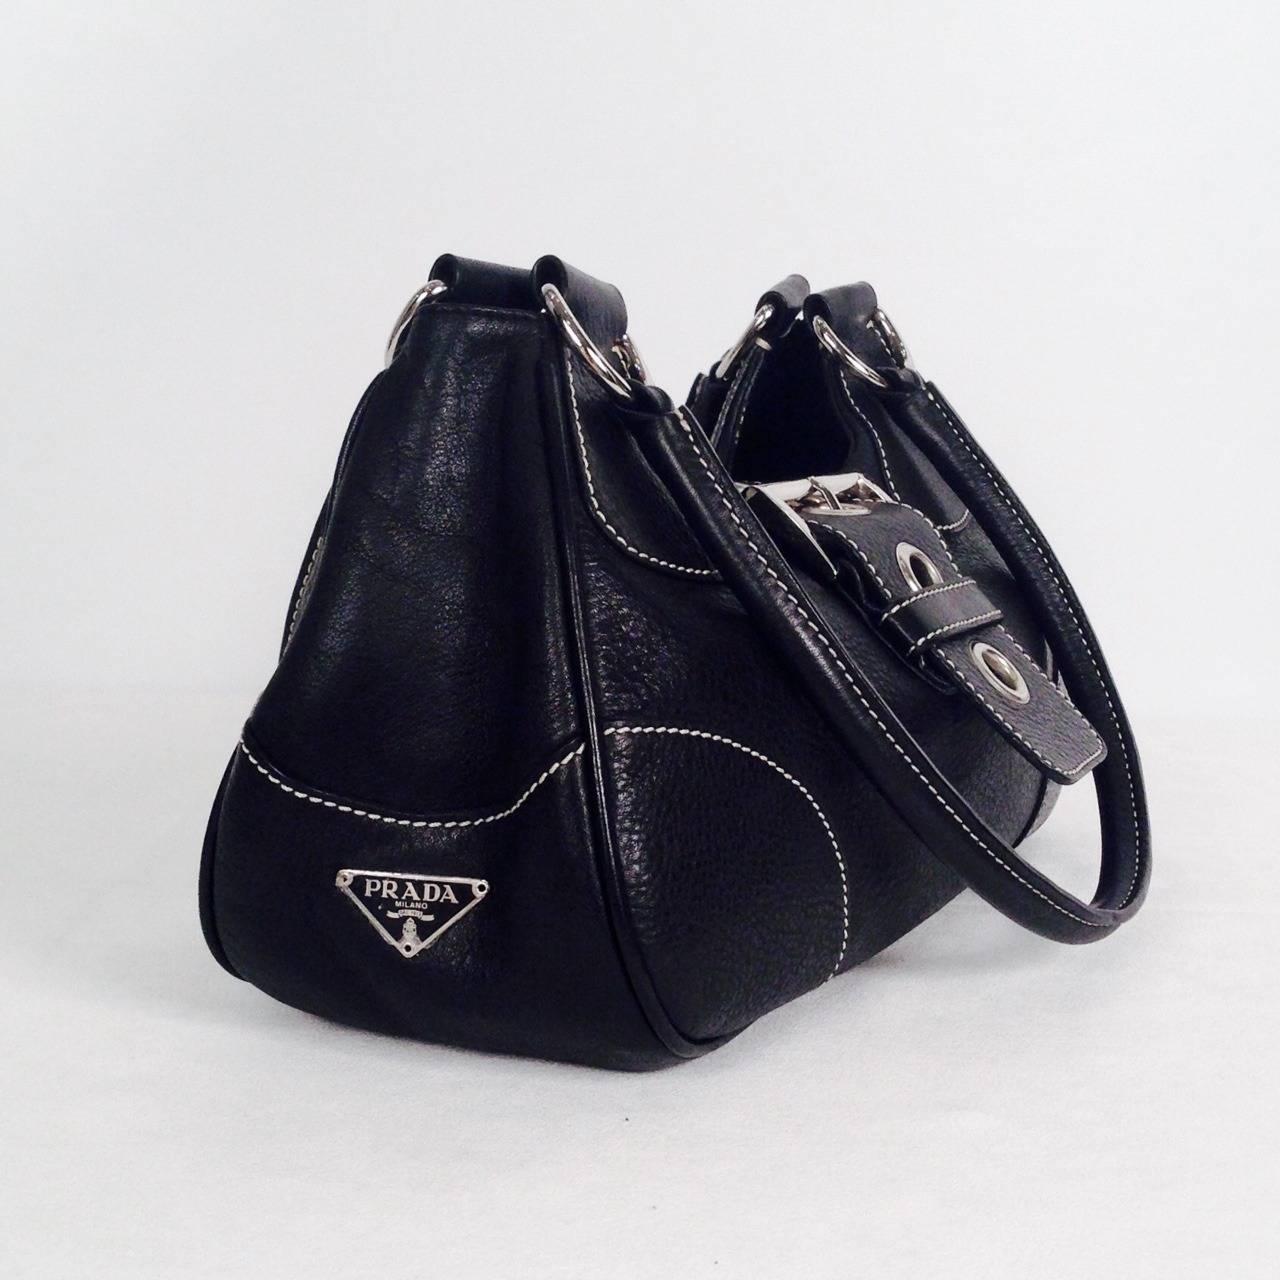 Prada Daino Box Nero Shoulder Handbag For Sale at 1stdibs